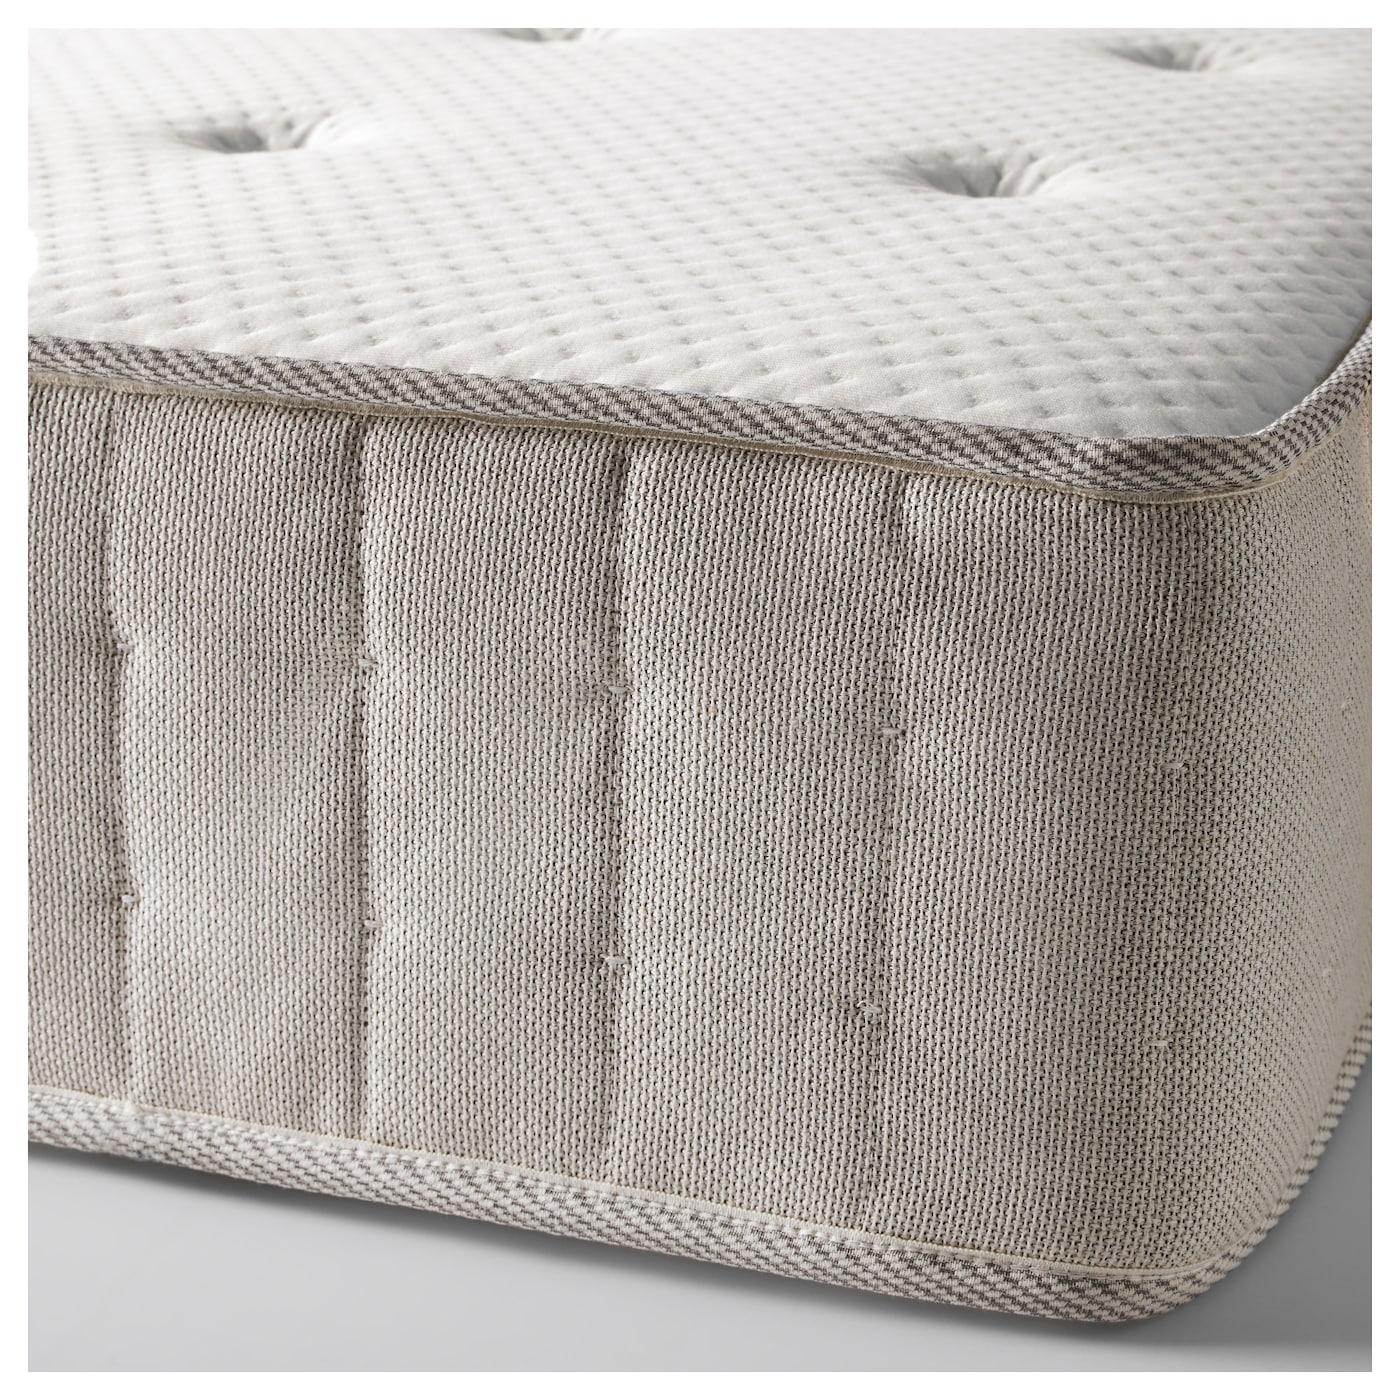 hesseng matelas ressorts ensach s mi ferme cru 160x200. Black Bedroom Furniture Sets. Home Design Ideas